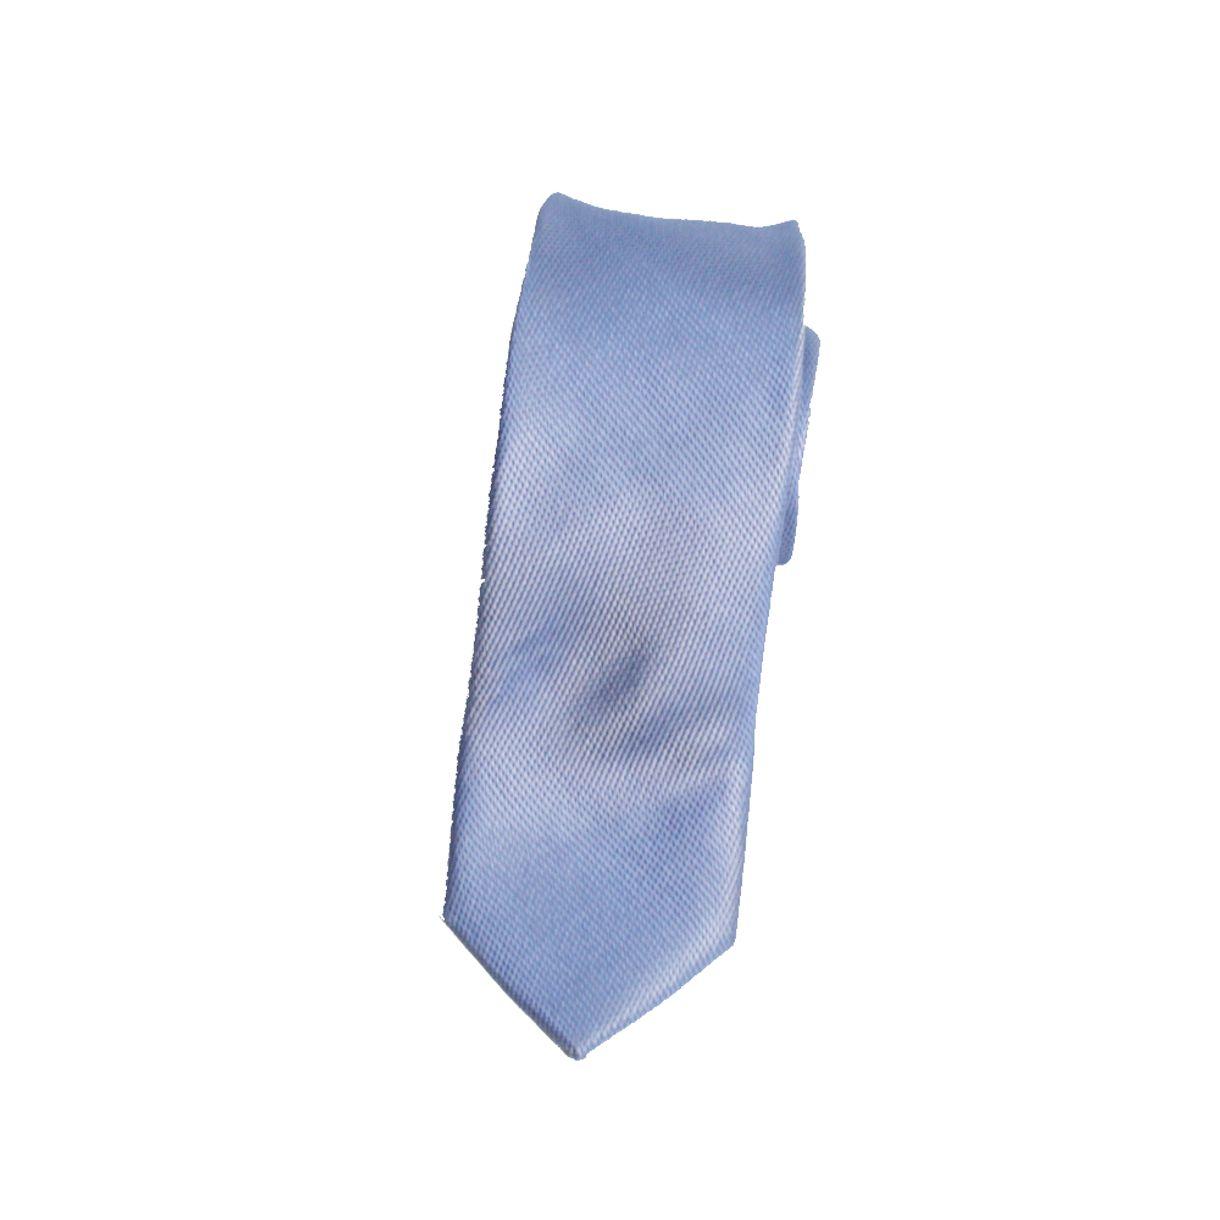 Gravata-Ricardo-Alemida-Slim-Fit-Azul